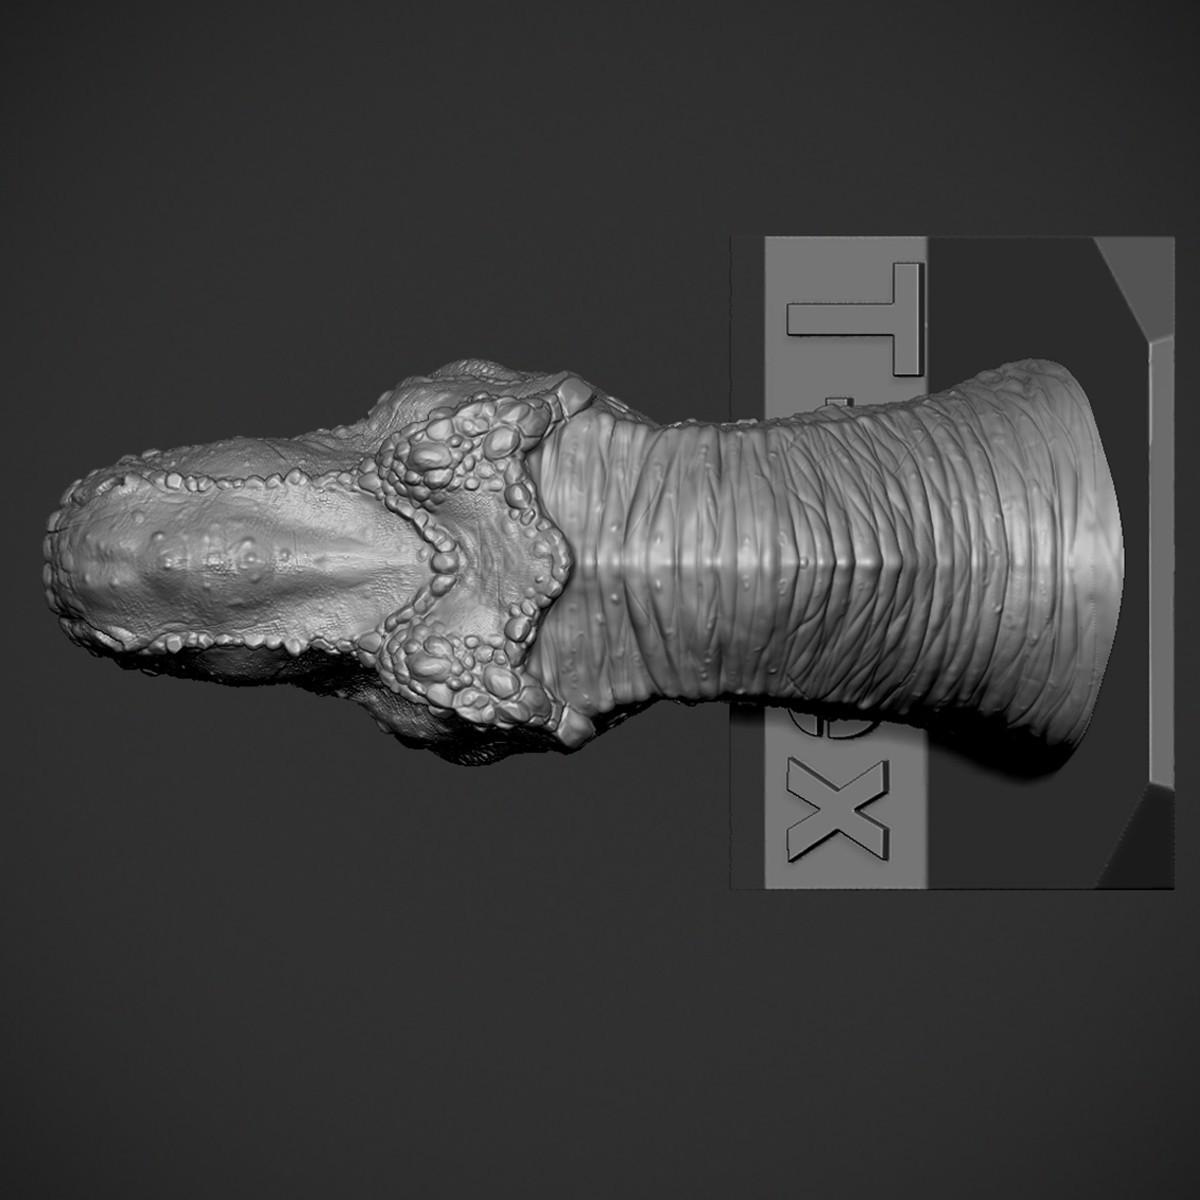 Z06.jpg Download OBJ file T-rex Tyrannosaurus • 3D printable object, Dynastinae